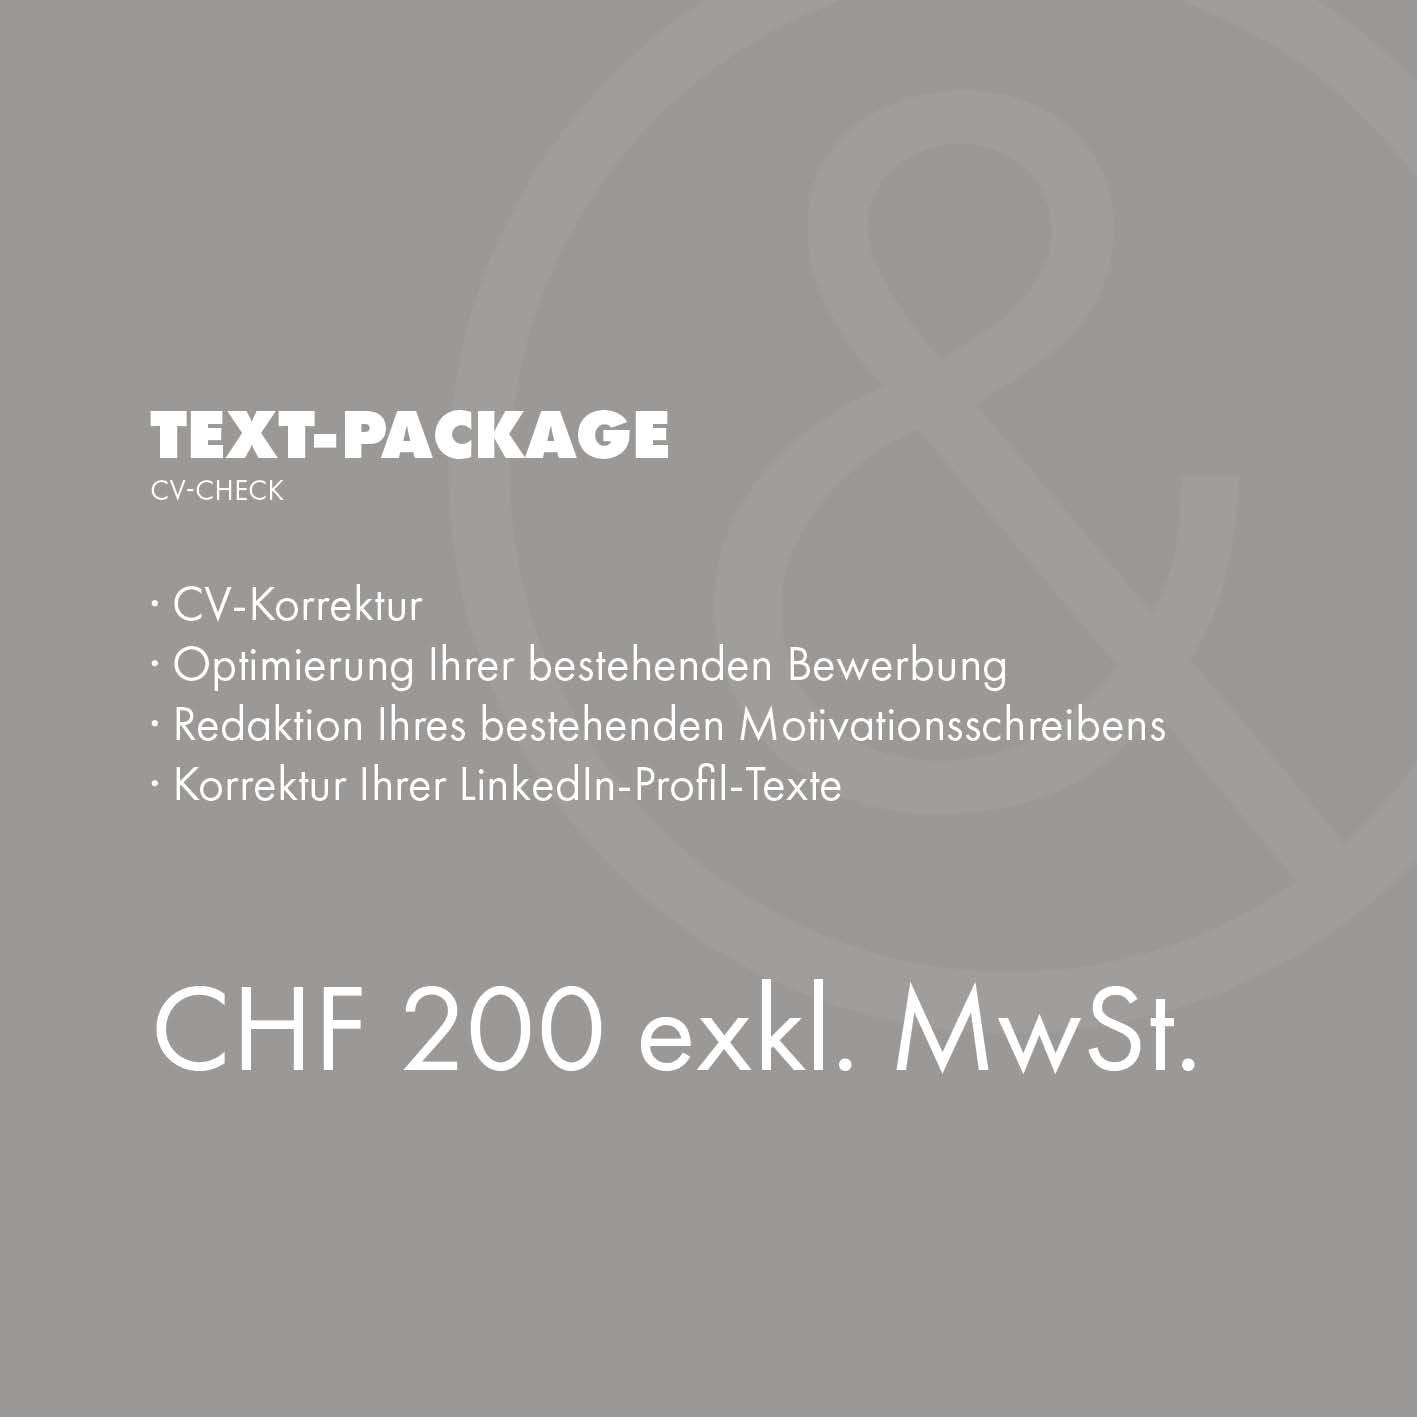 Text-Package-Bewerbung-partnersingmbh.jpg